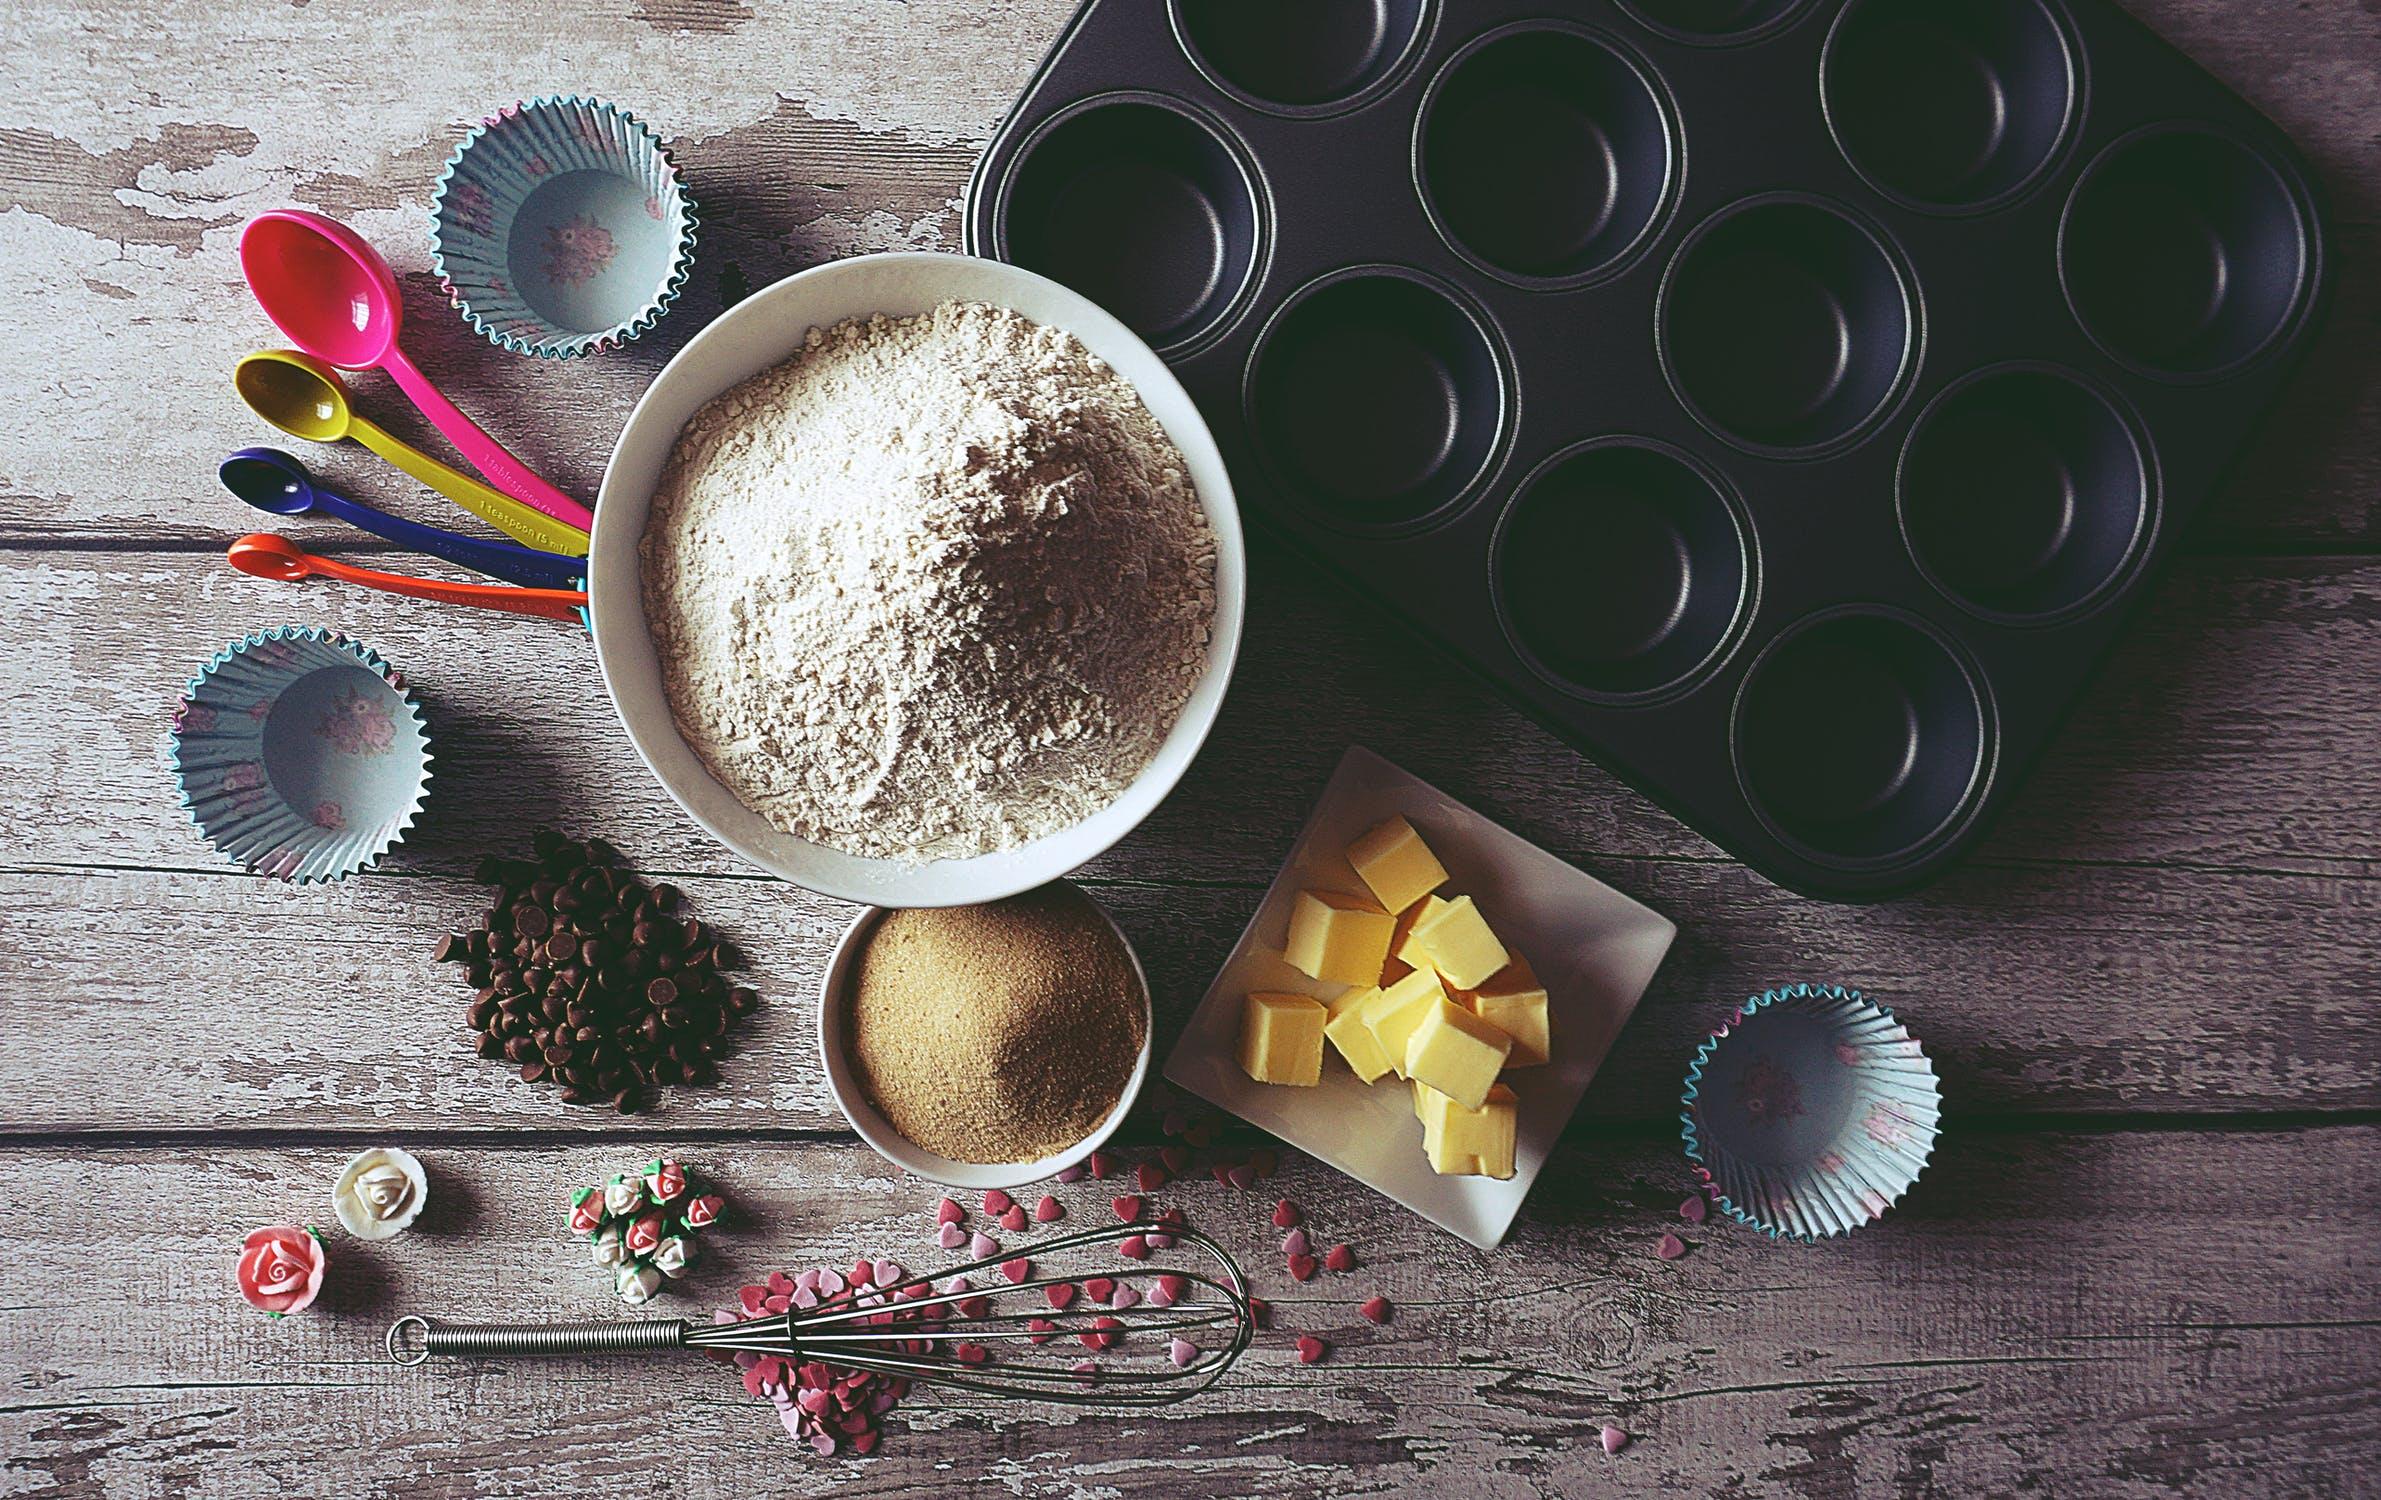 14 Kitchen Gadgets That Will Transform Your Baking Skills